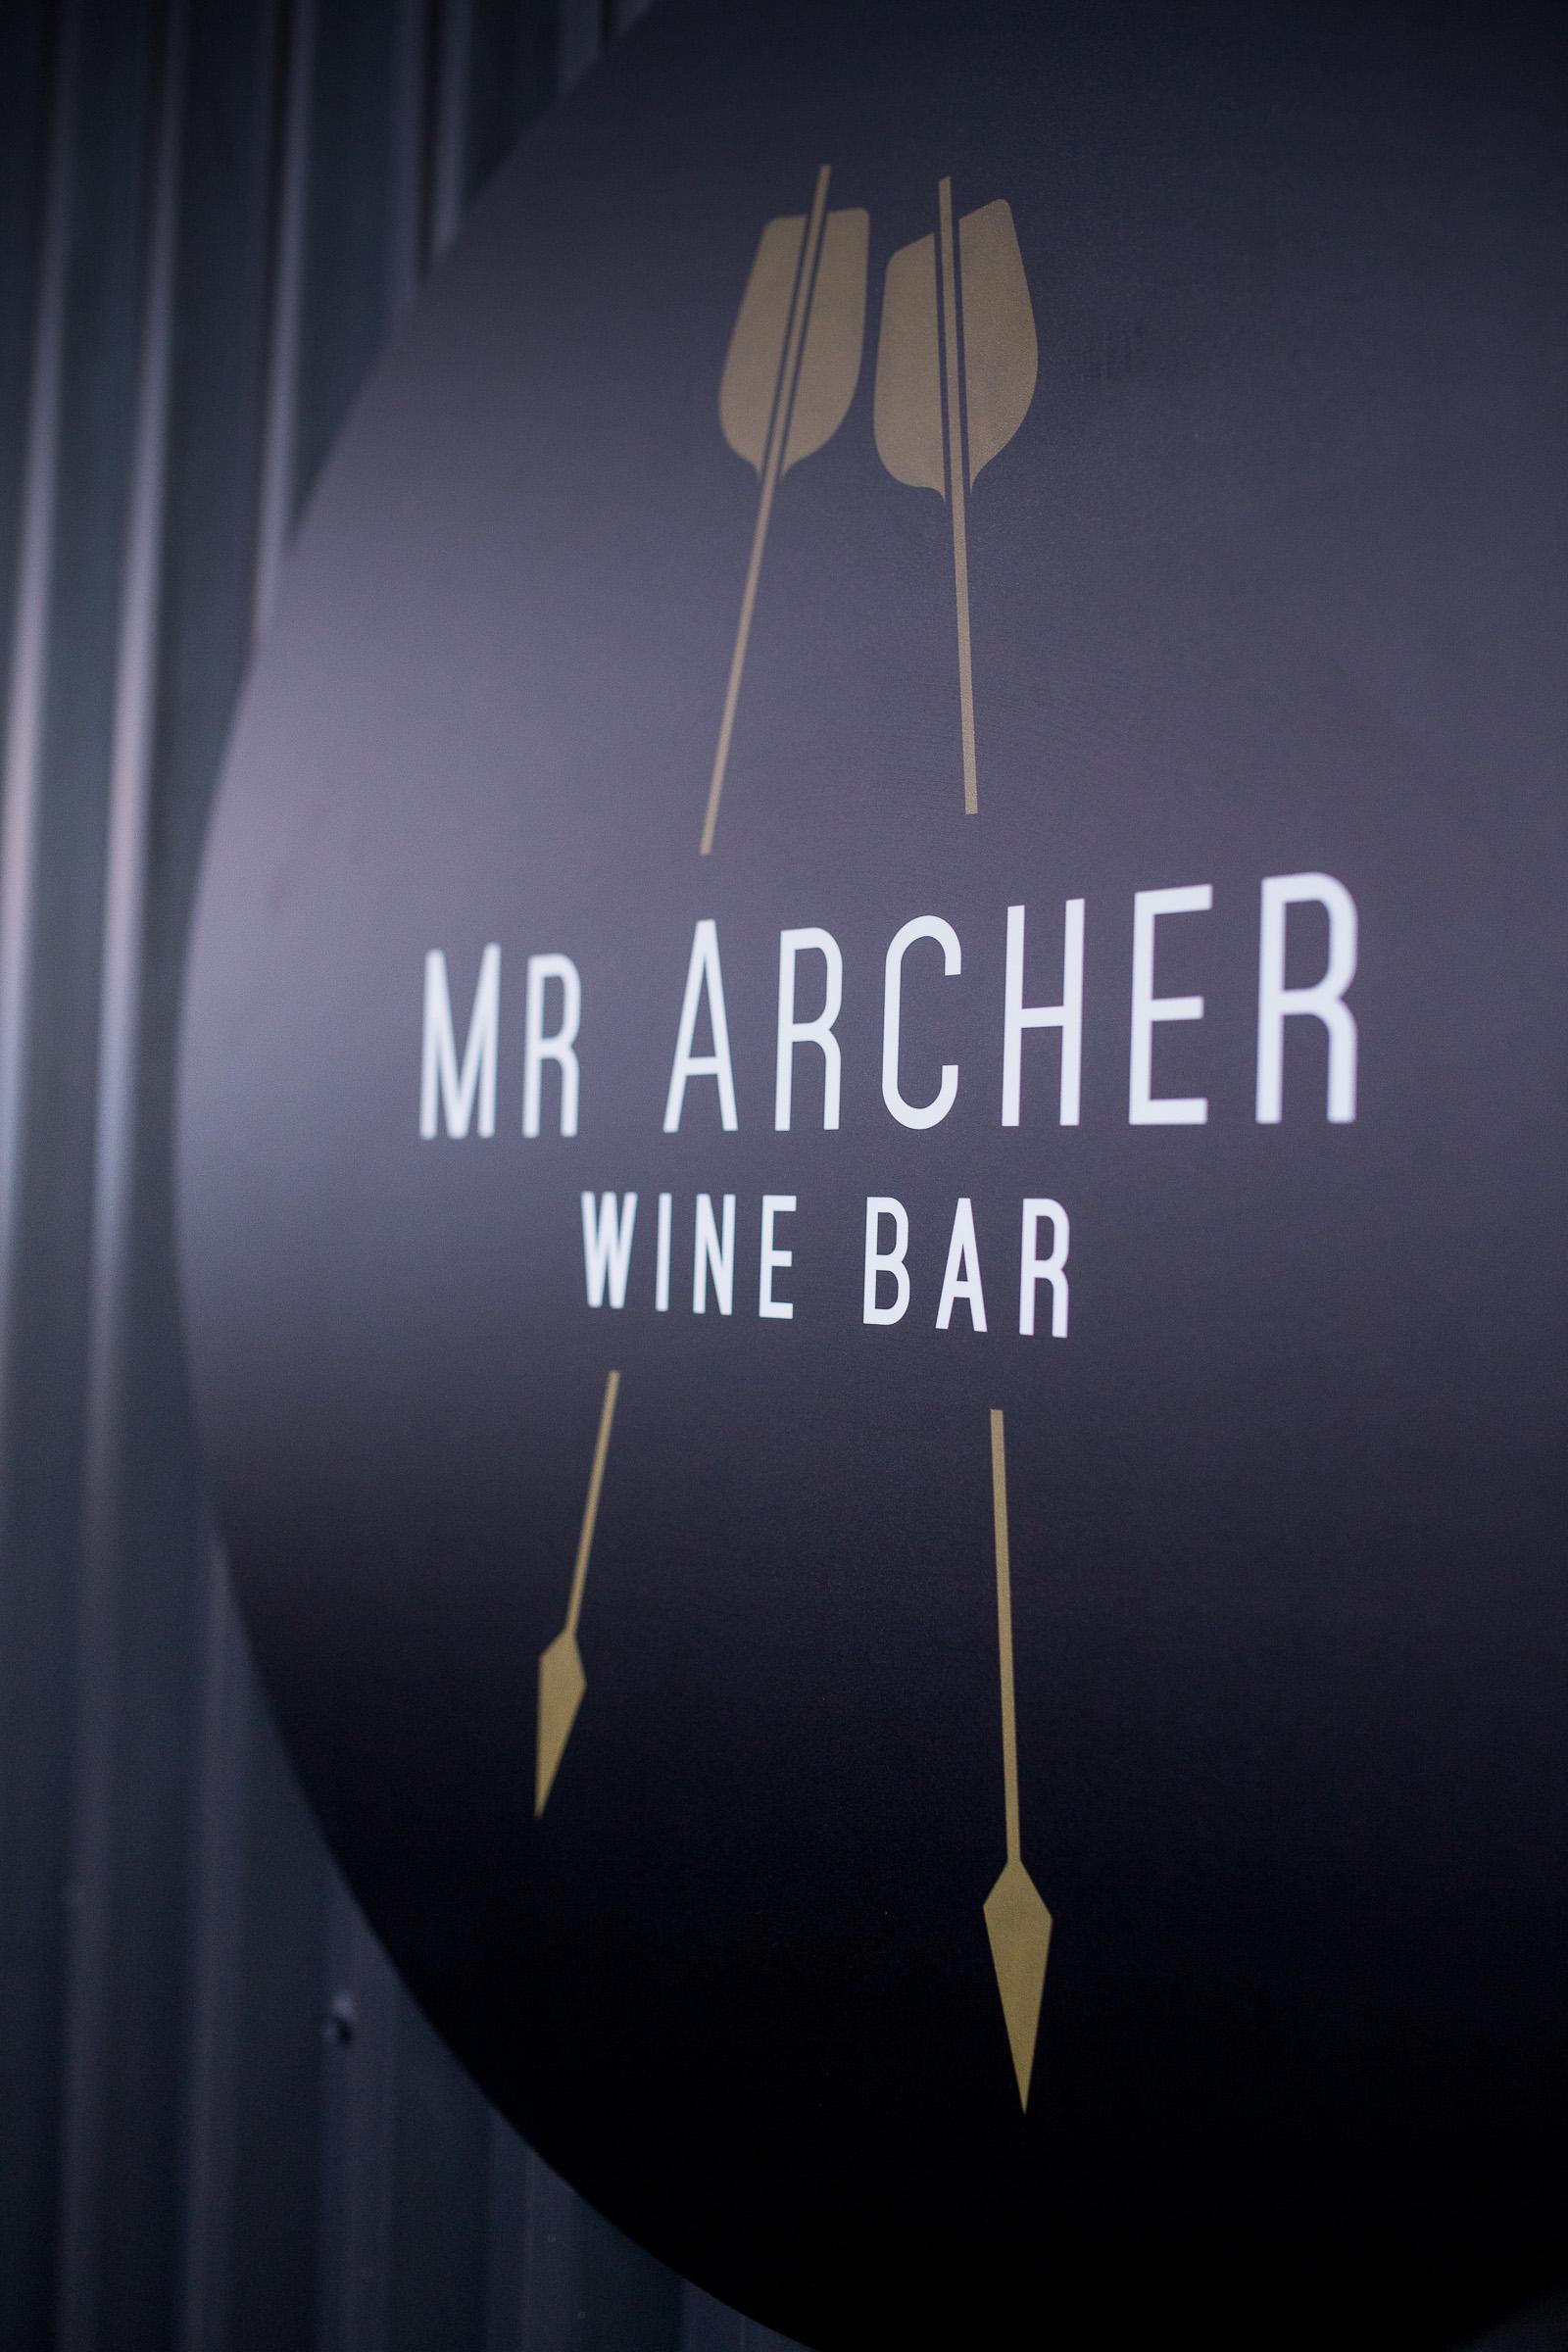 Mr Archer Wine Bar_LR_02.JPG